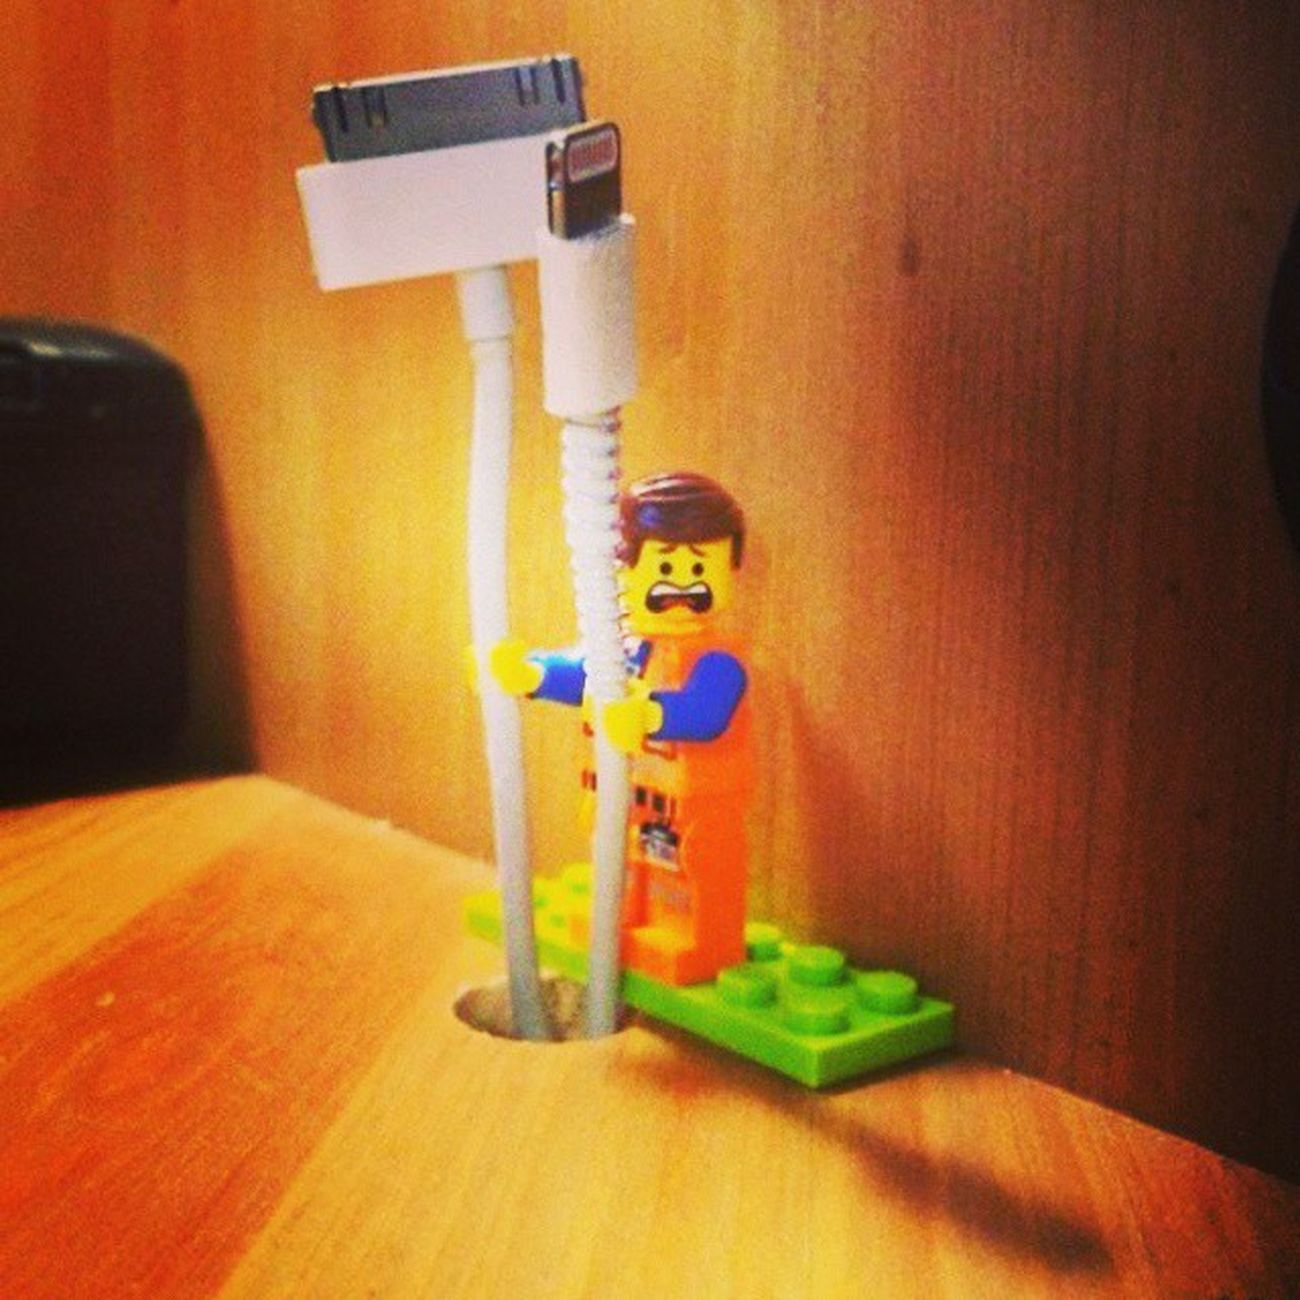 LEGO Toyyktru @lego_ykt